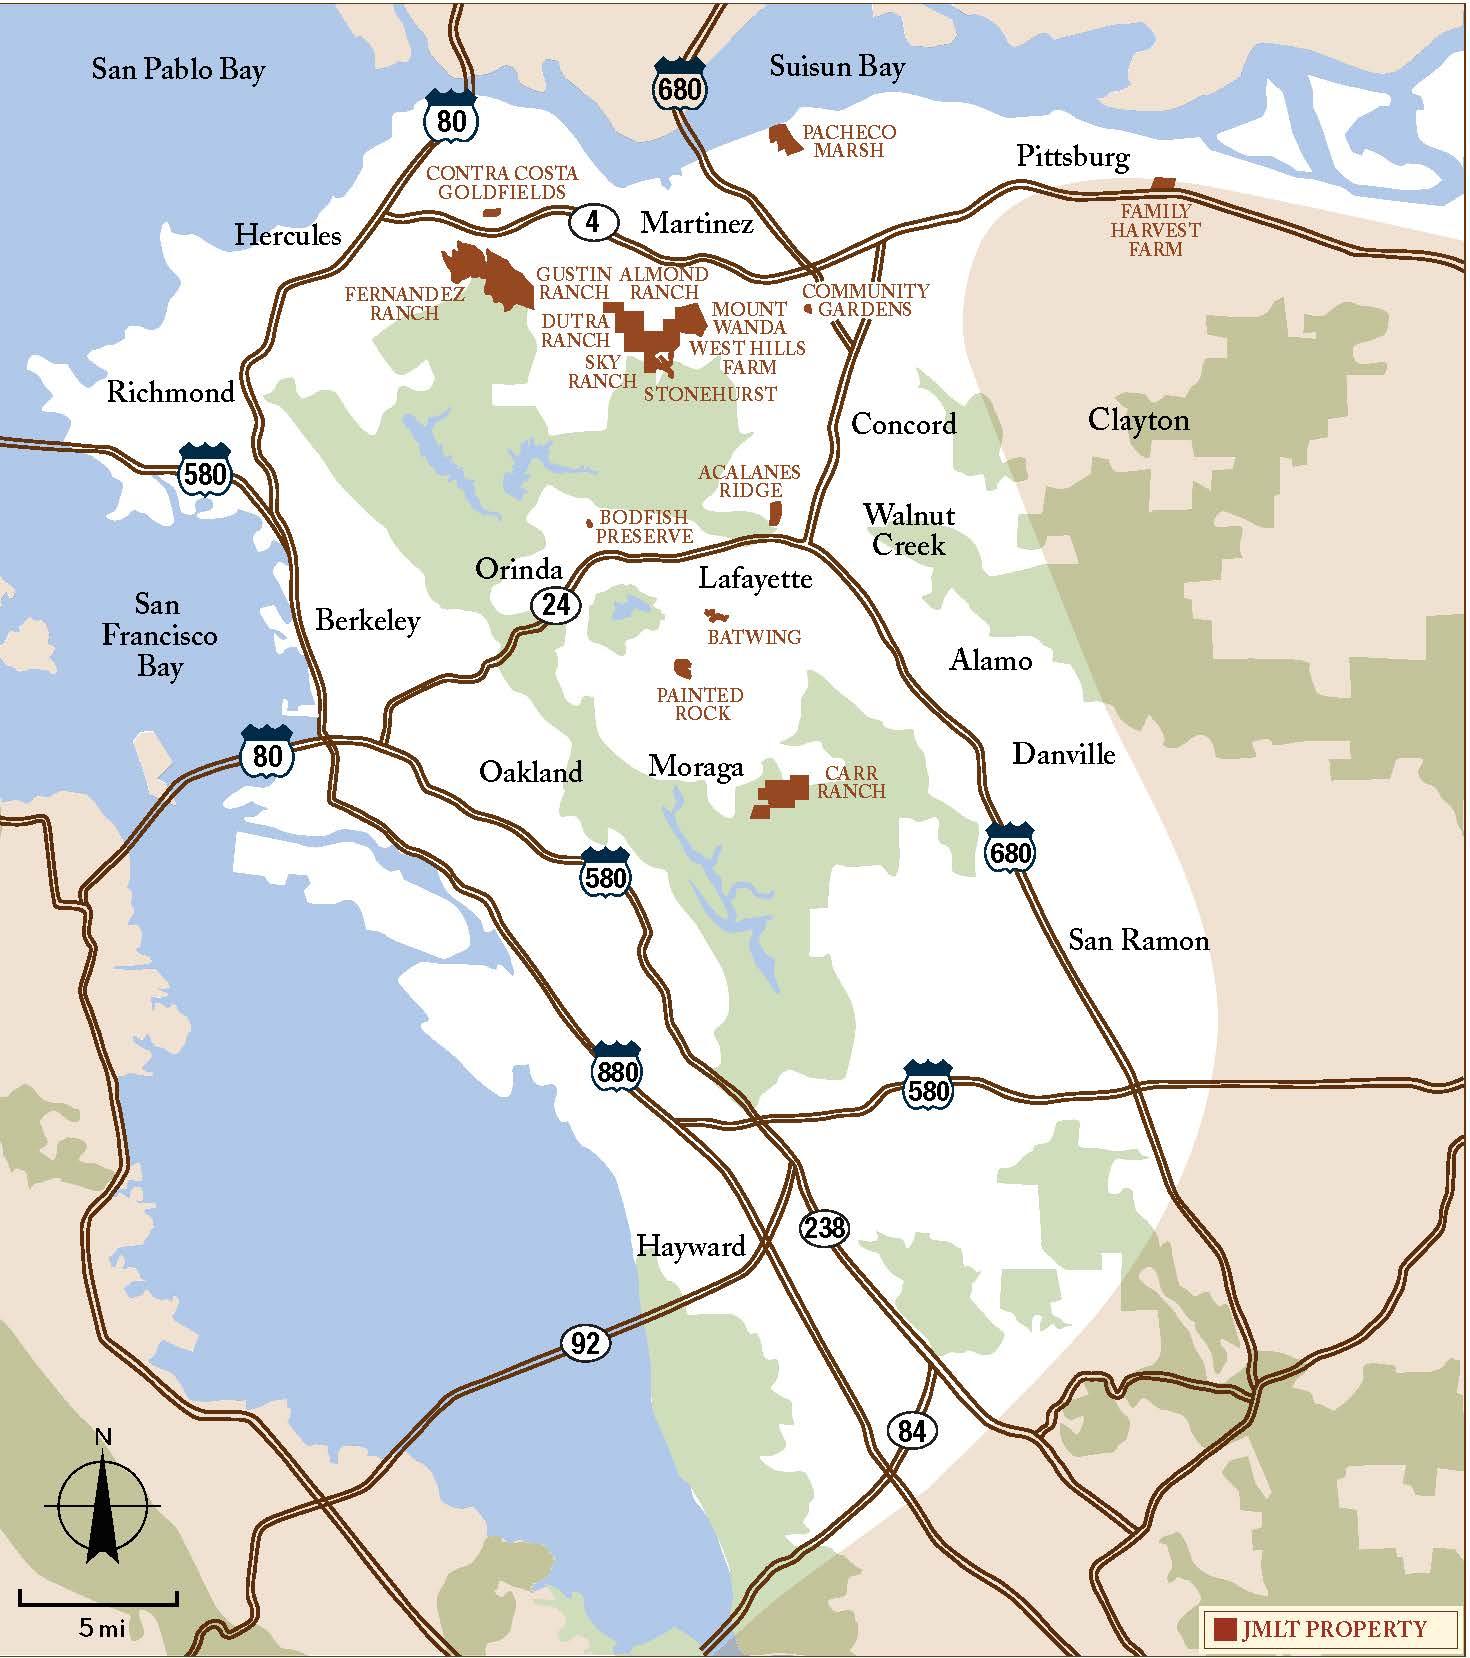 JMLT-strategic-map-2020